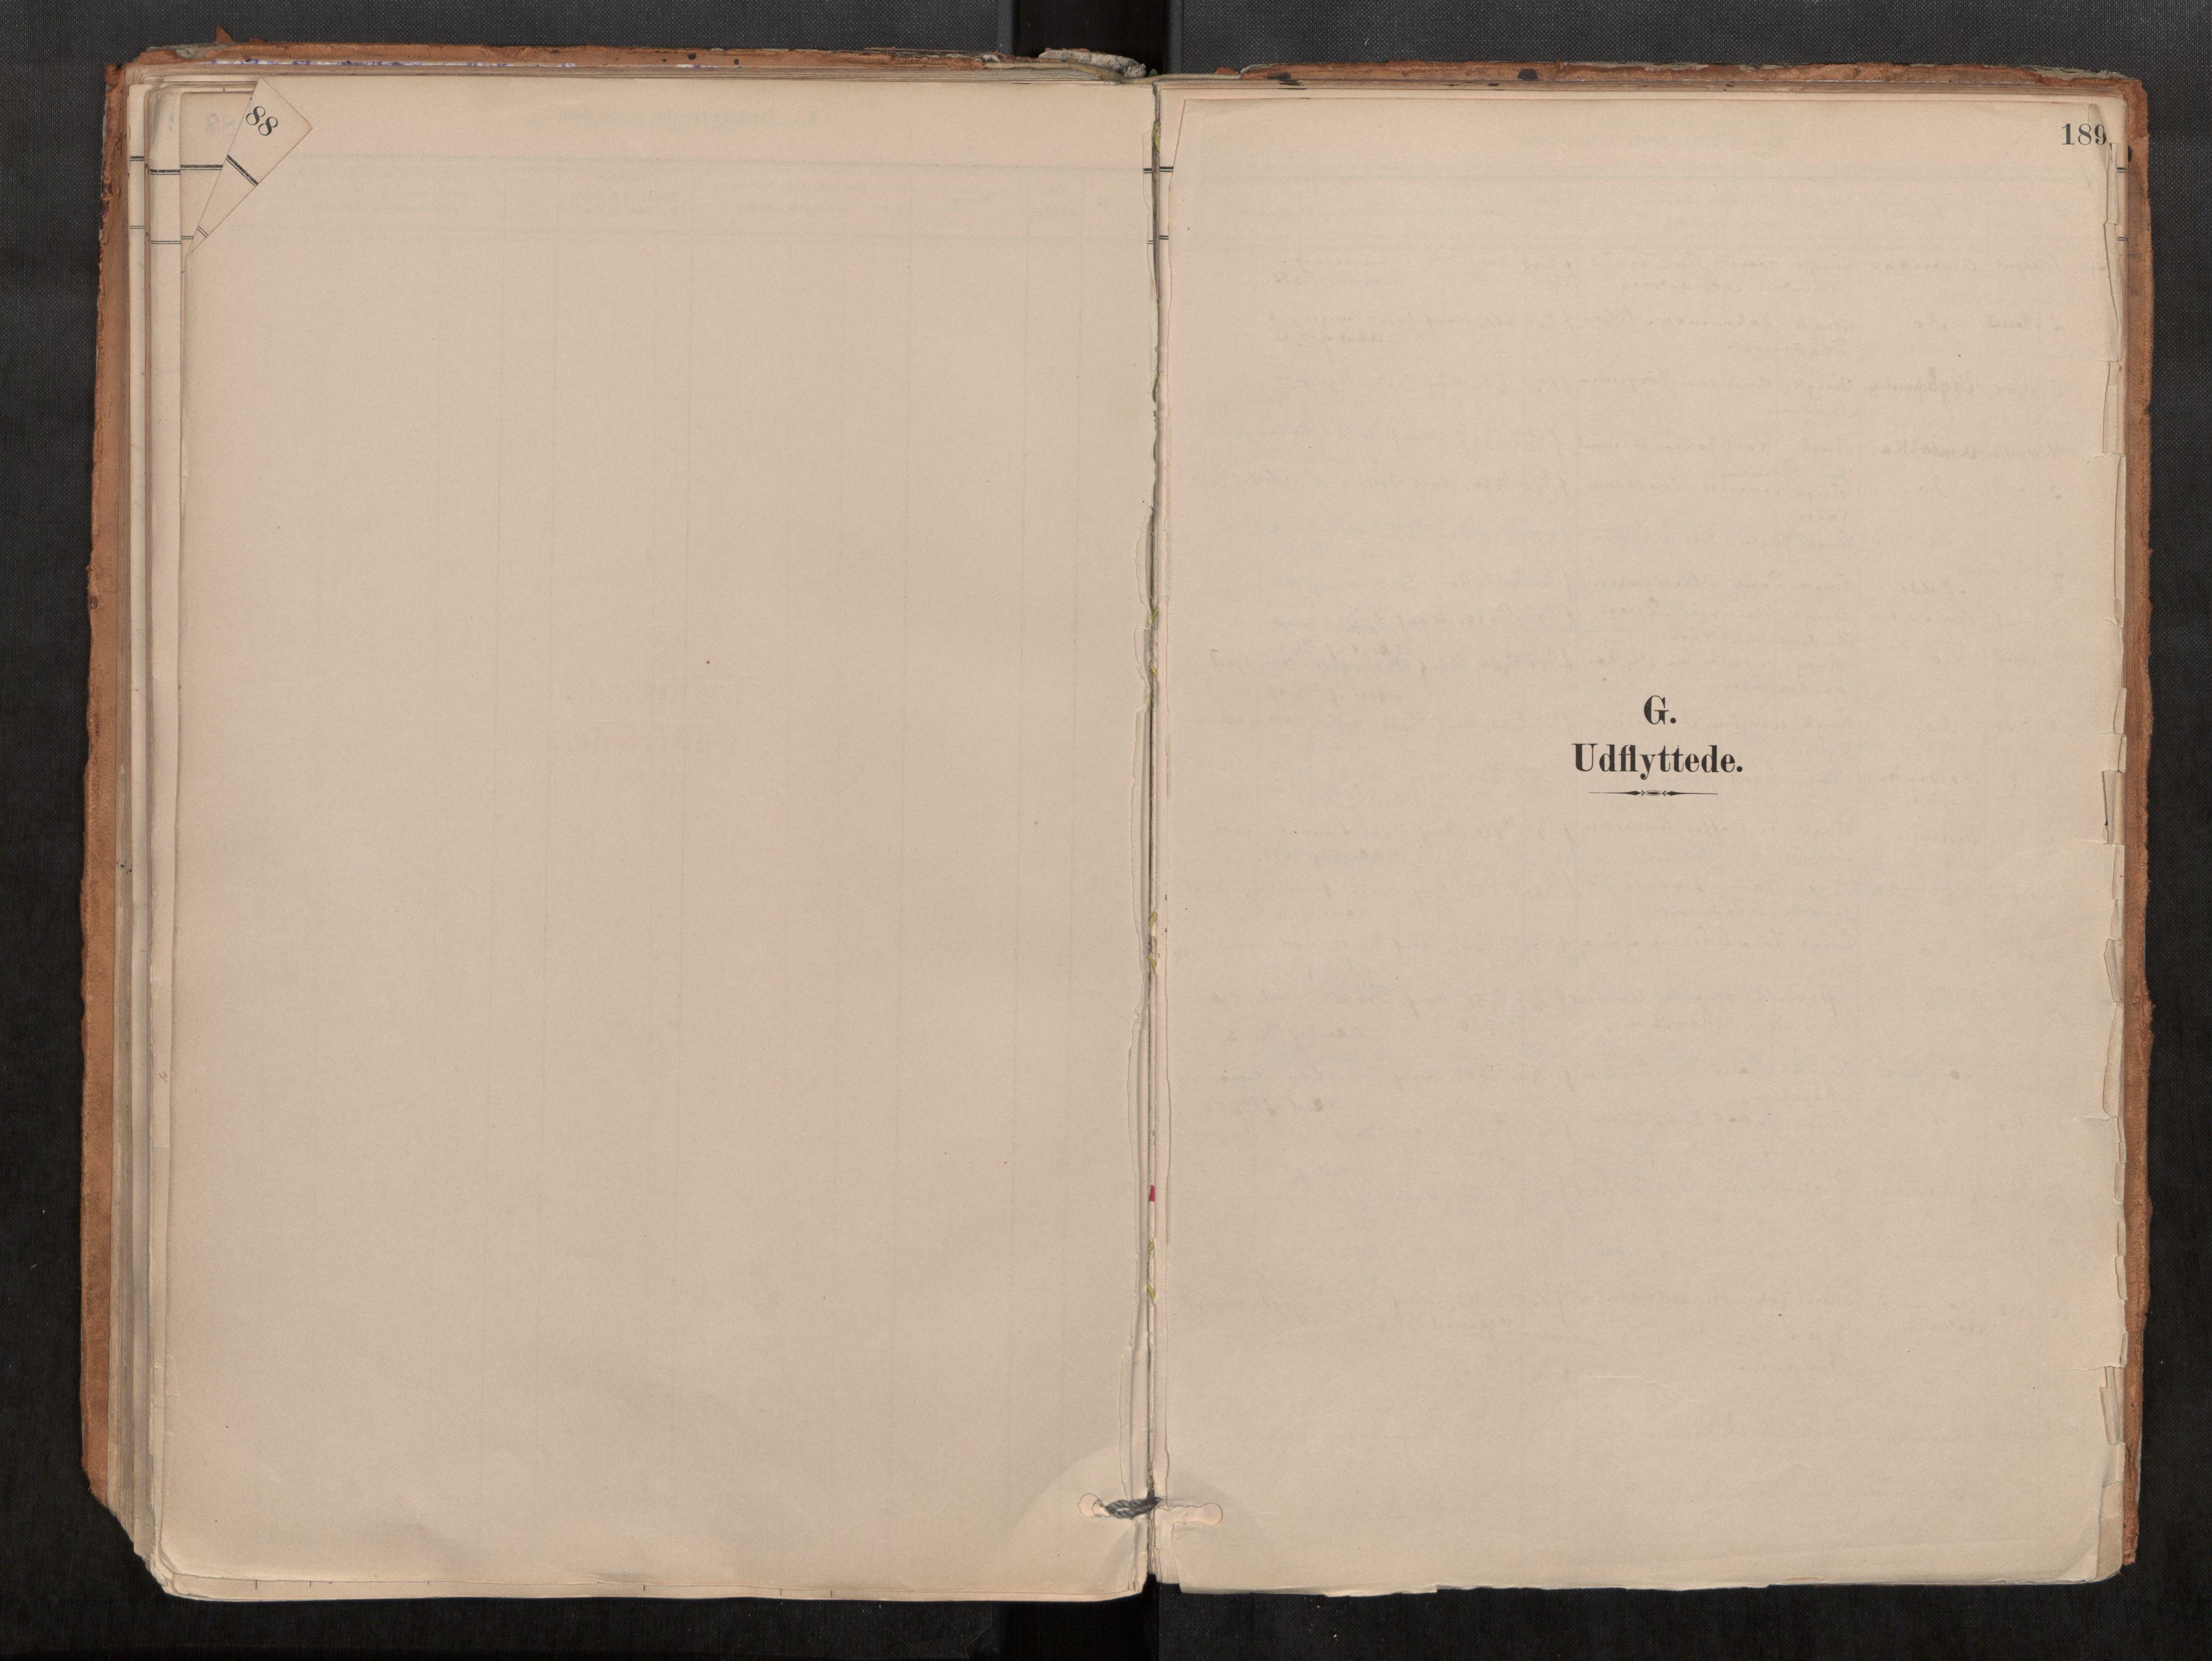 SAT, Grytten sokneprestkontor, Ministerialbok nr. 546A03, 1882-1920, s. 189